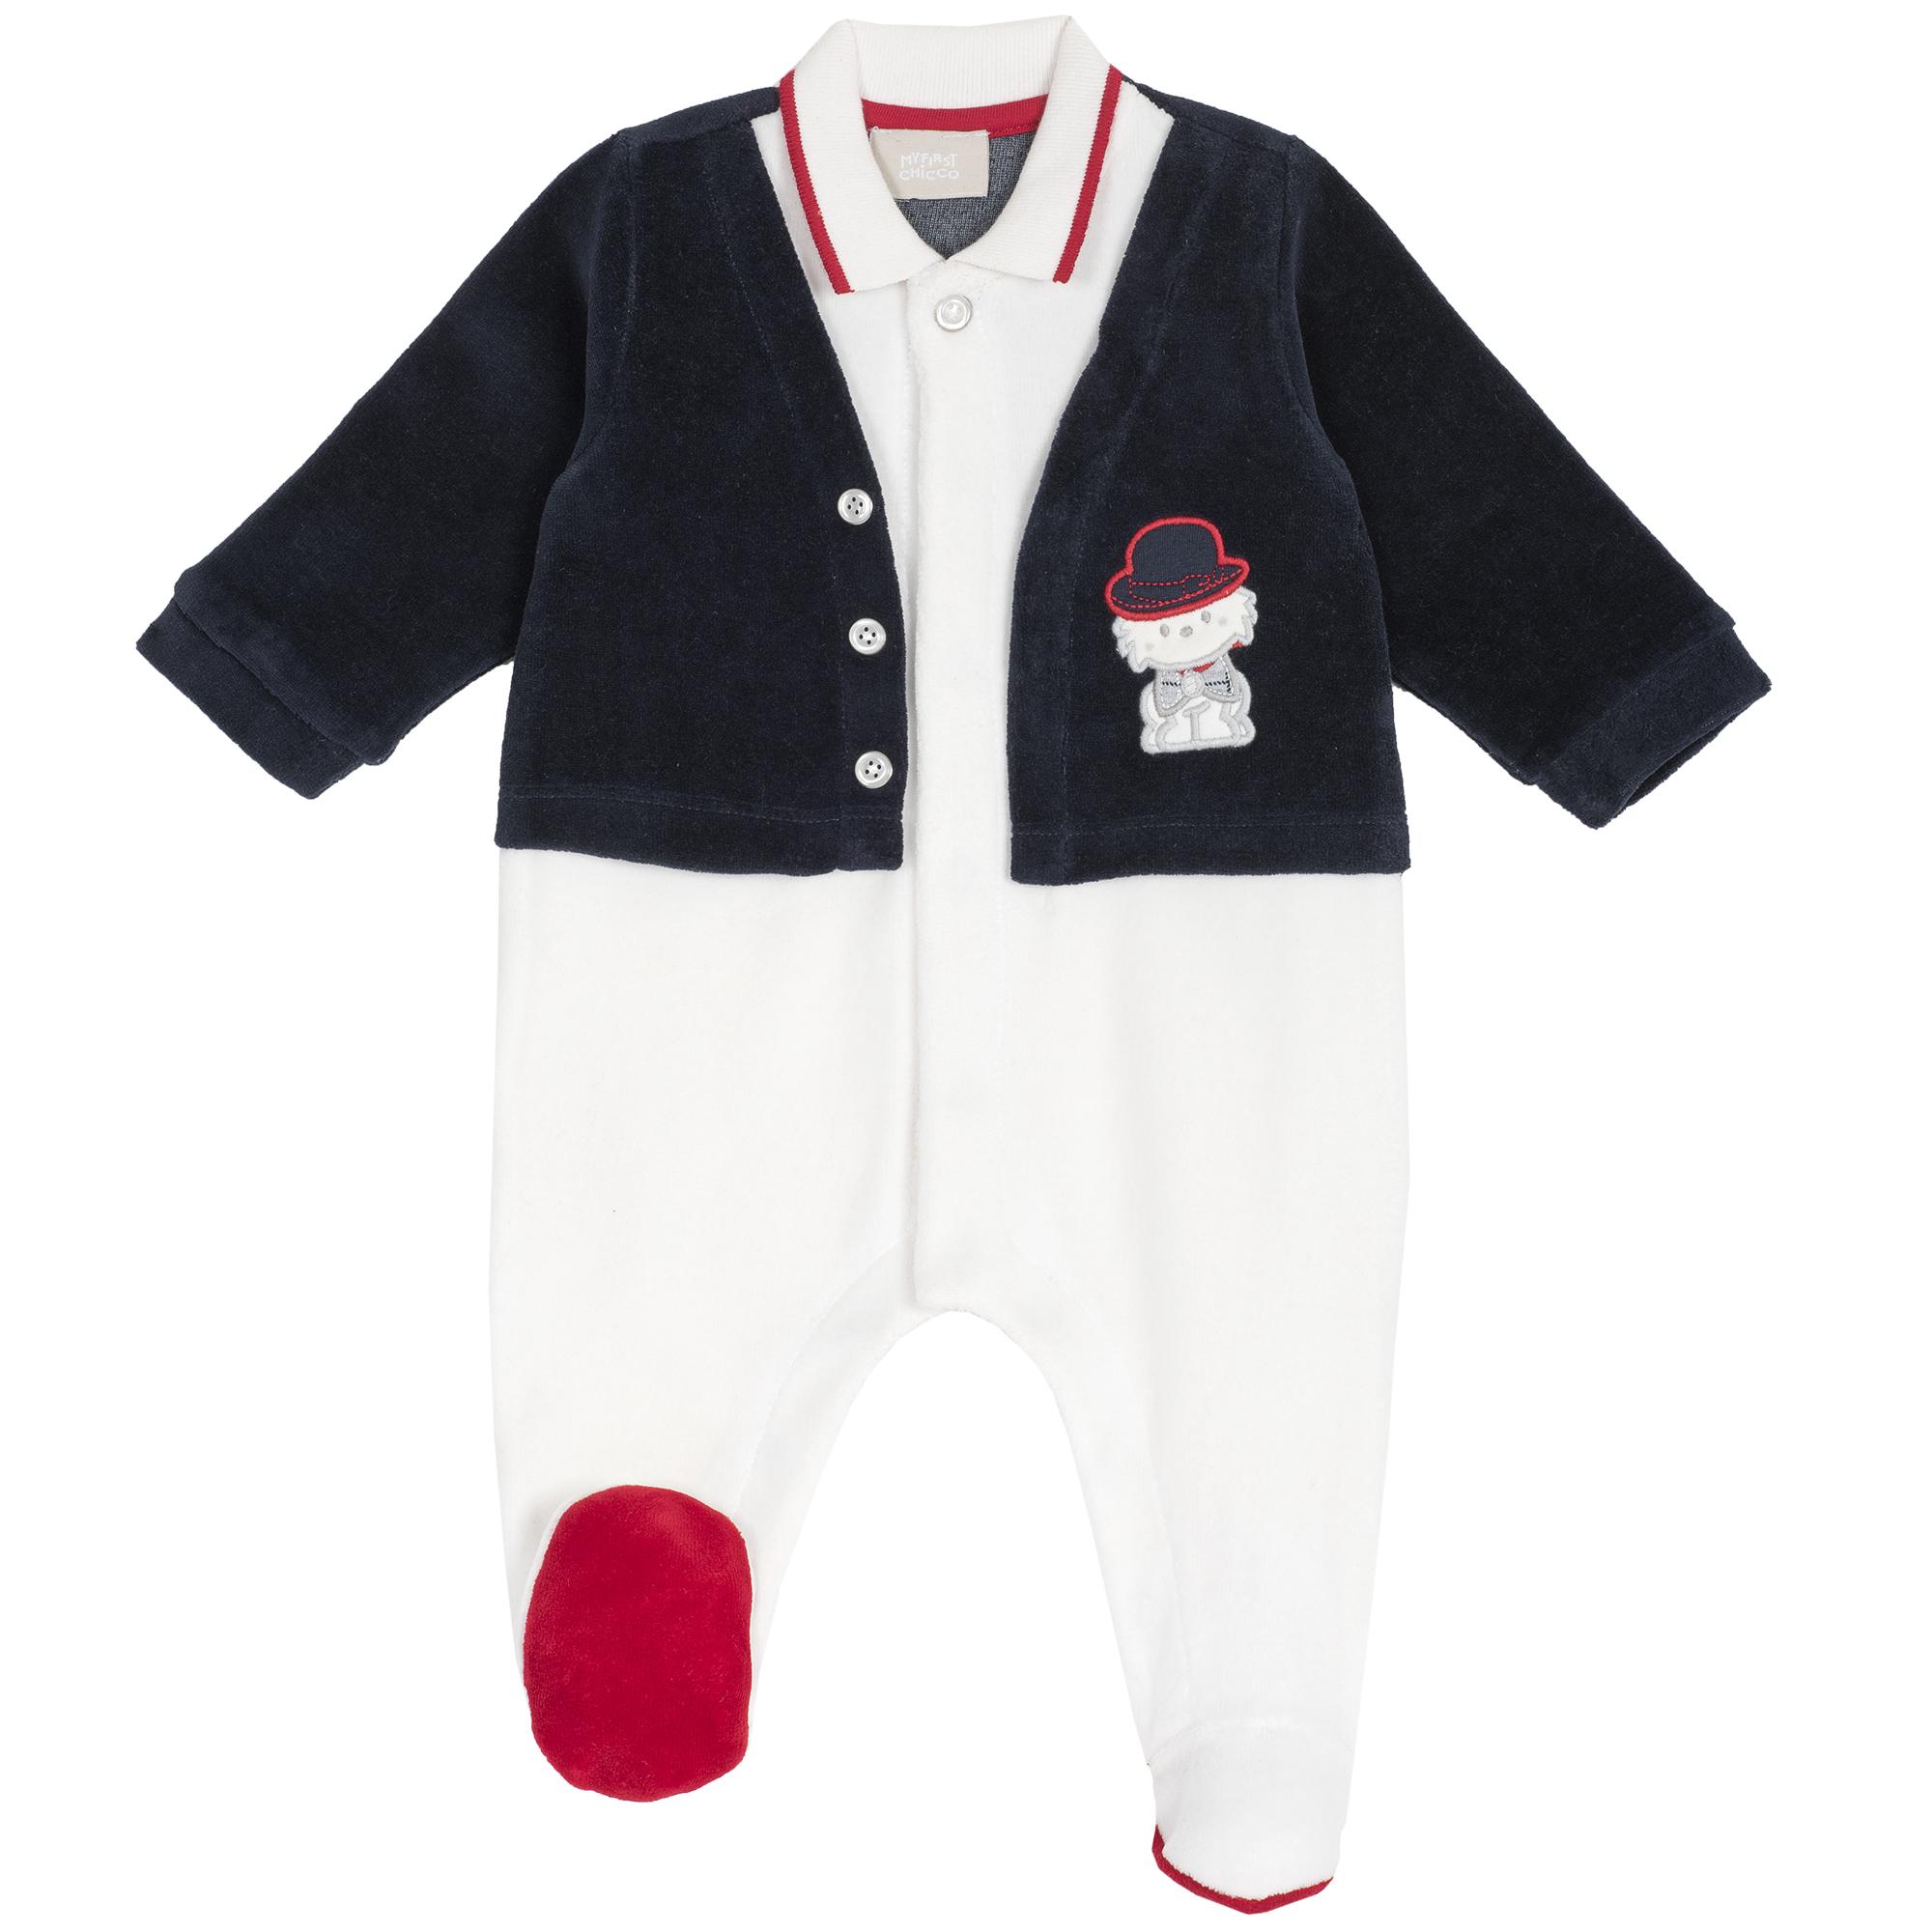 Salopeta copii Chicco, cu jacheta si guleras, 21900 din categoria Salopete/Body